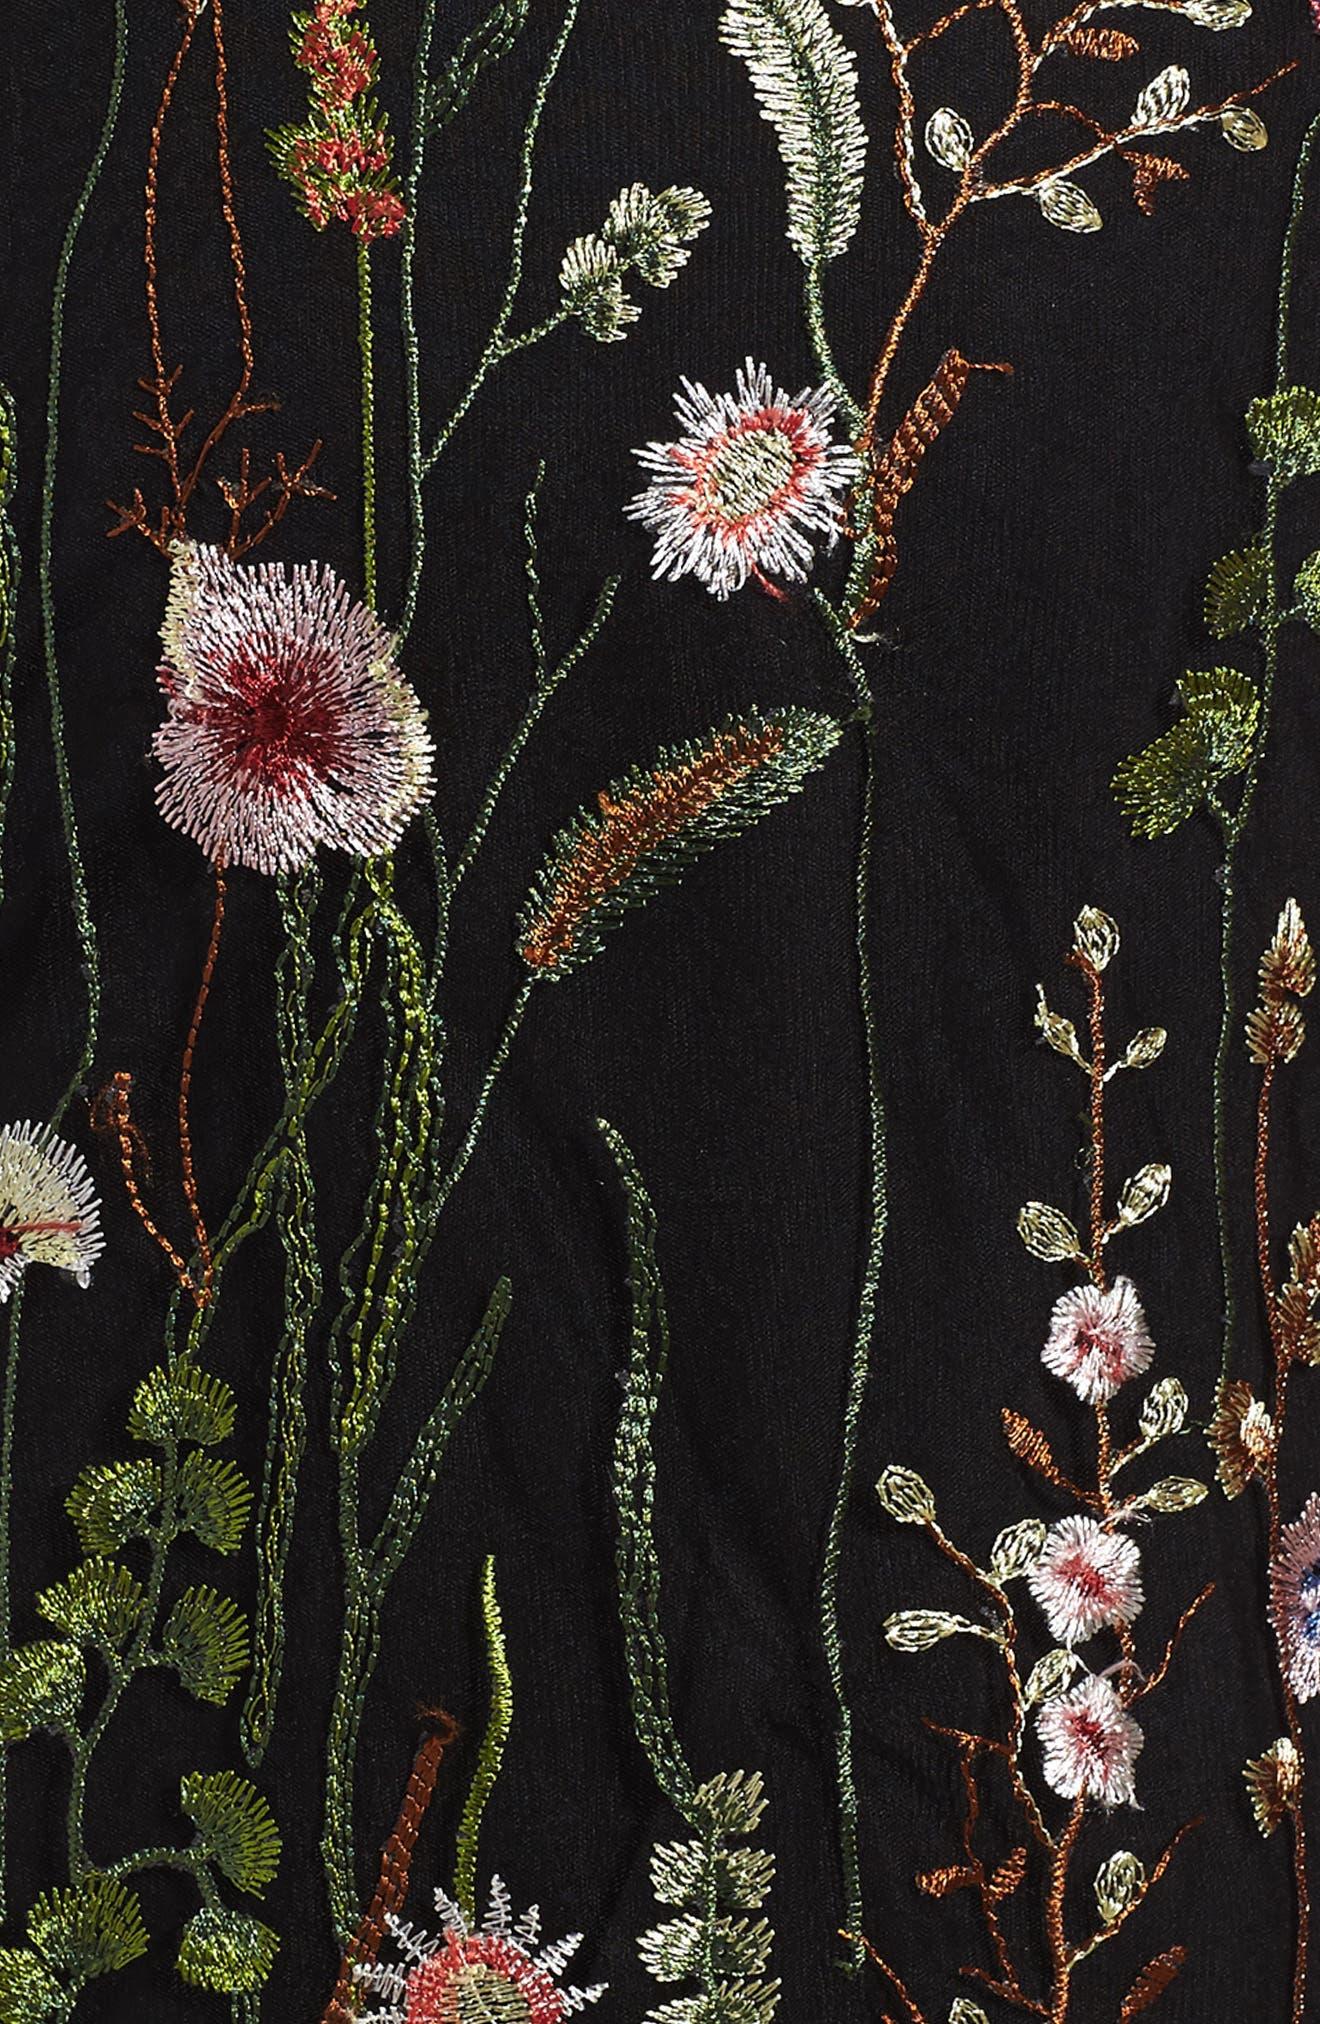 Embroidered Mesh Dress,                             Alternate thumbnail 3, color,                             Black Multi